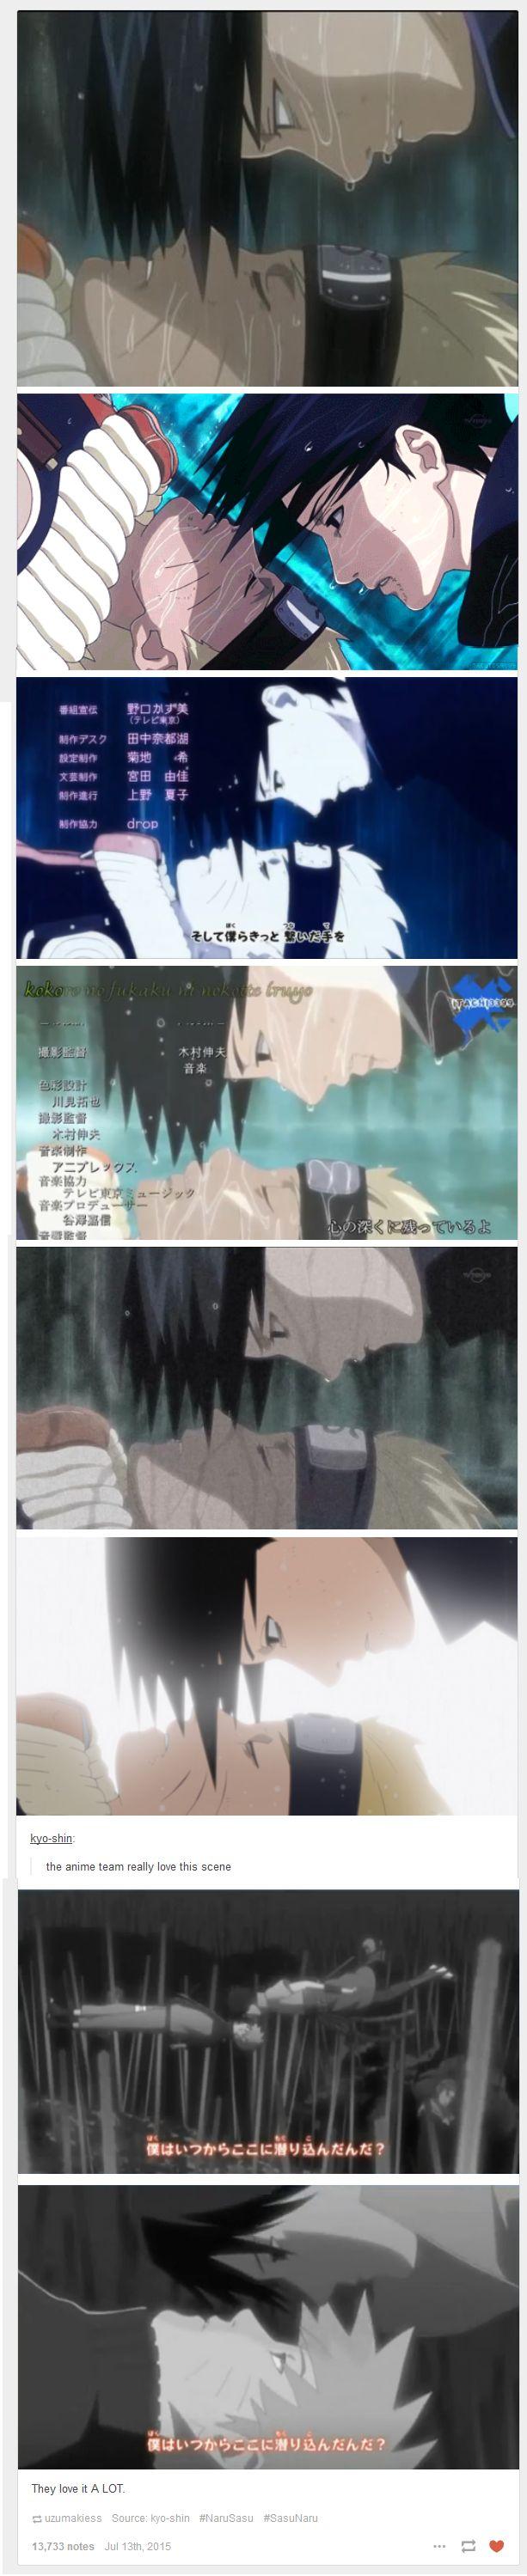 Naruto & Sasuke <33 || The anime team really love this scene... They love it A LOT!! ||| Me too(≧▽≦)